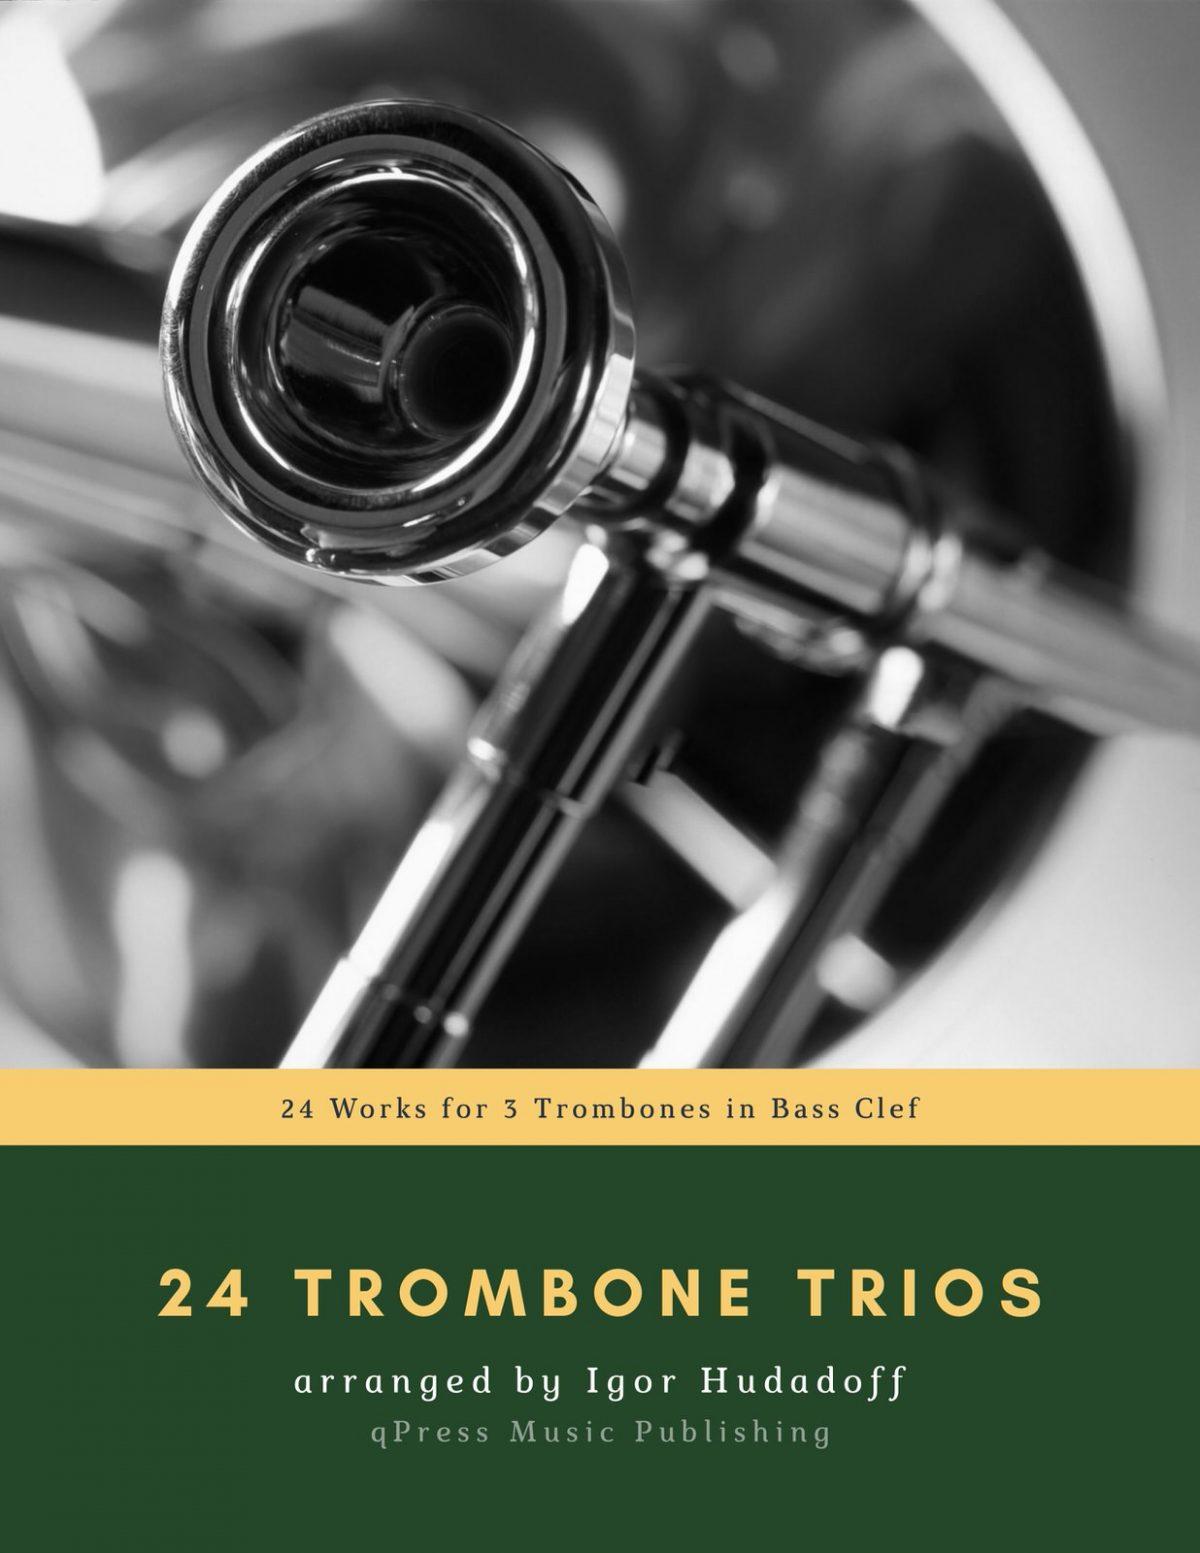 Hudadoff, 24 Trombone Trios-p01